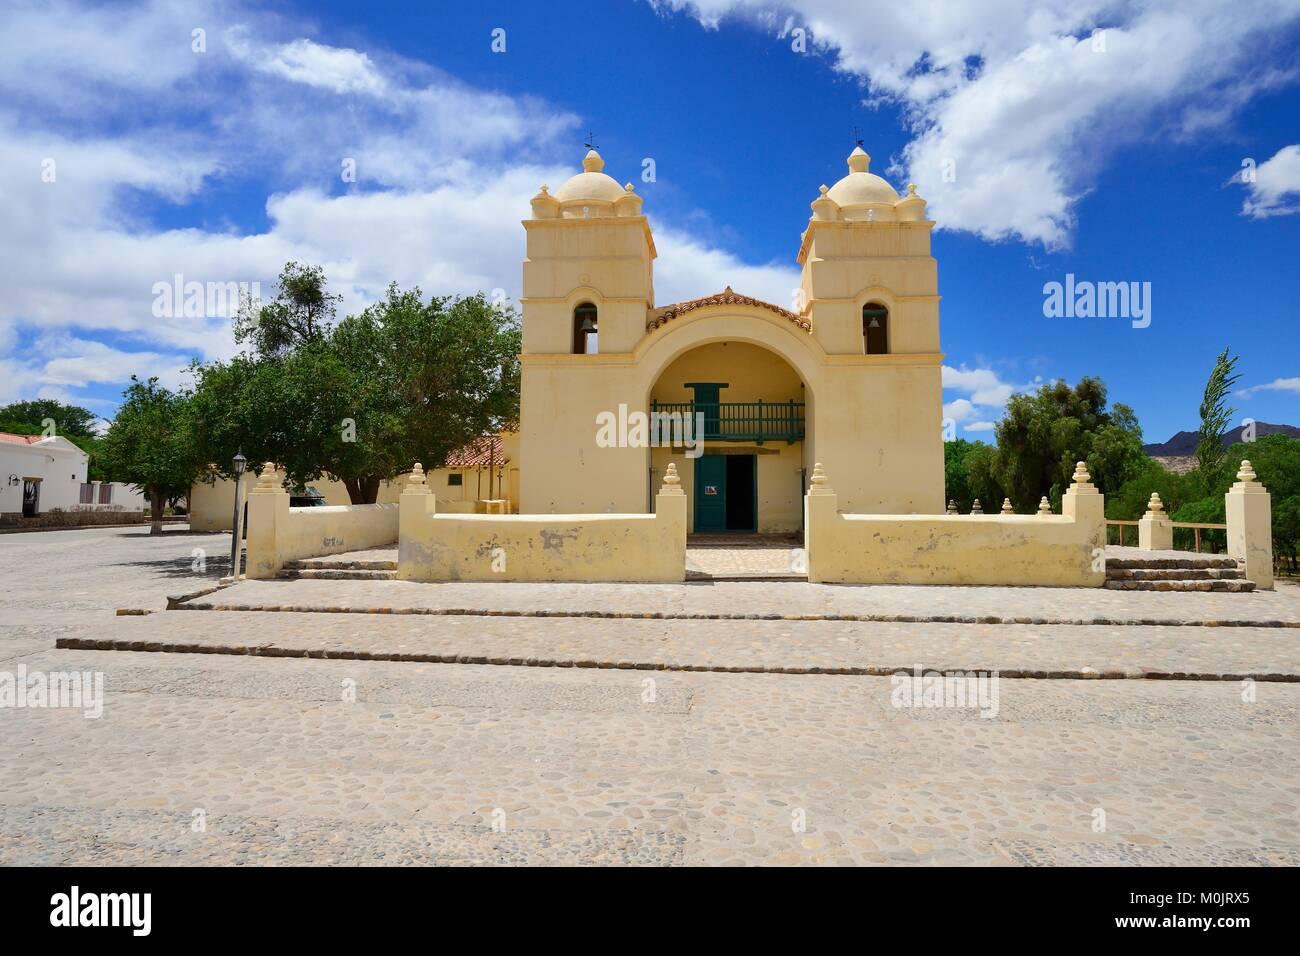 Church of Iglesia San Pedro de Nolasco, Molinos, Province of Salta, Argentina - Stock Image